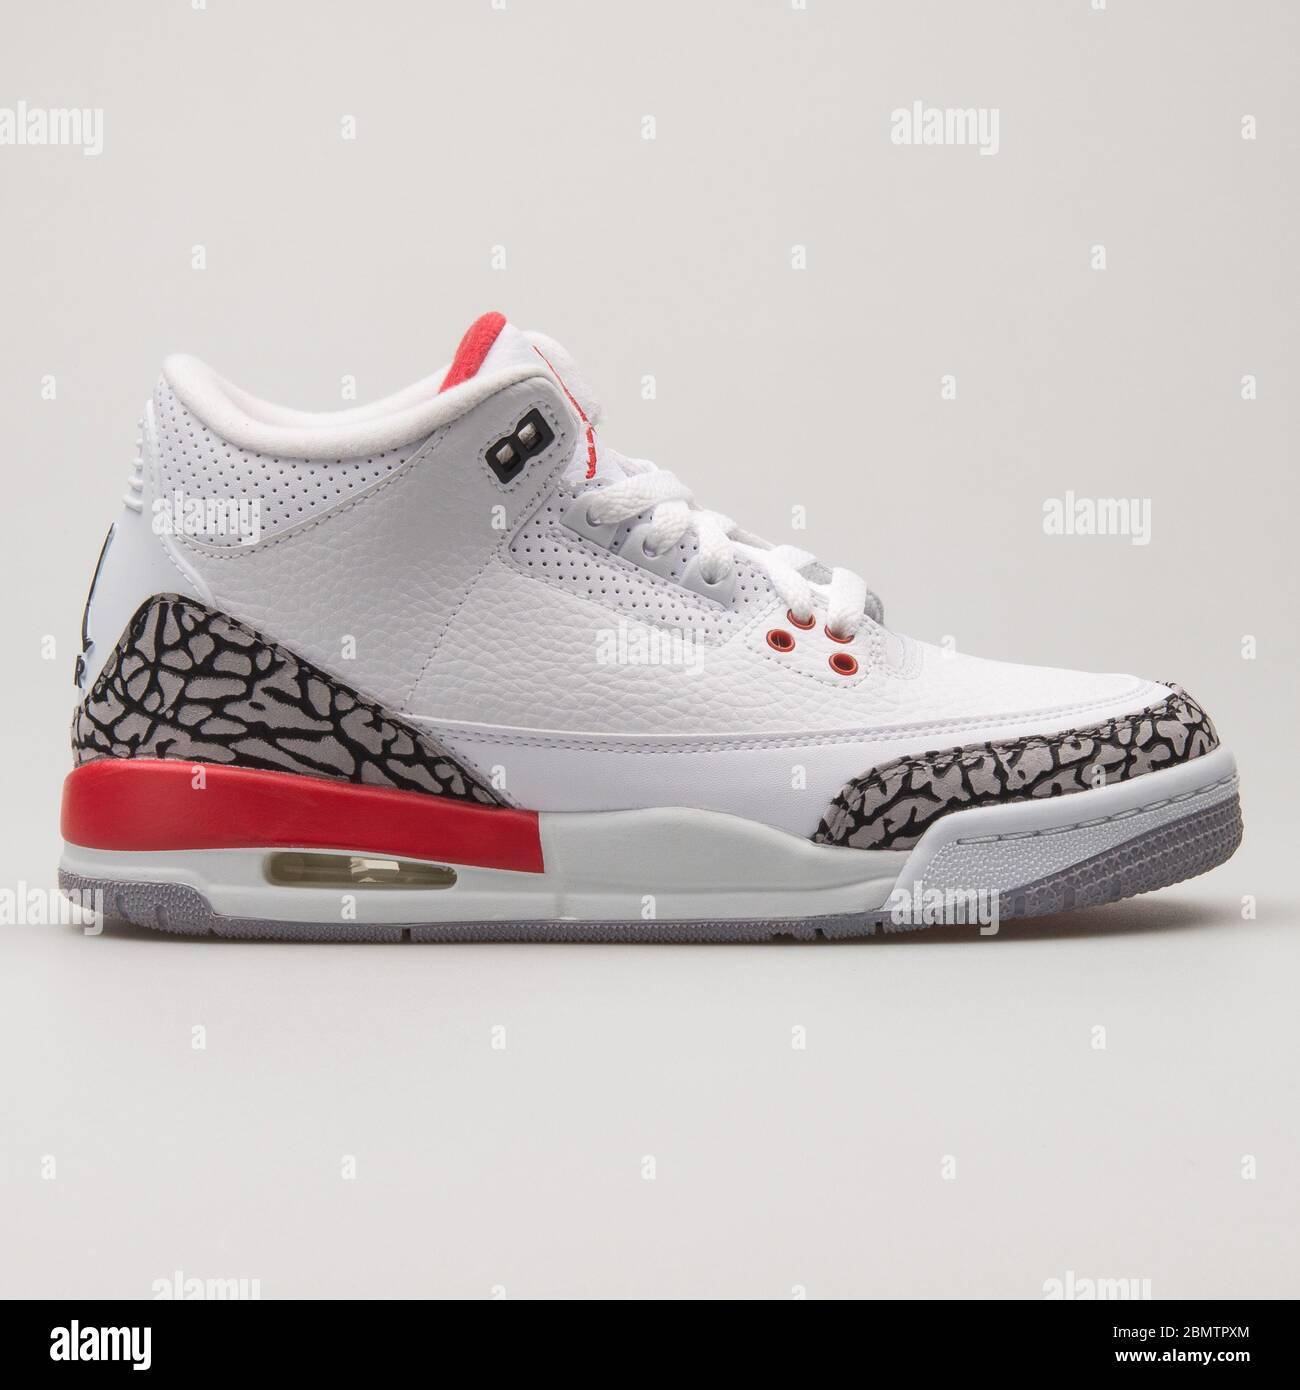 Nike Air Jordan 4 Retro white. grey